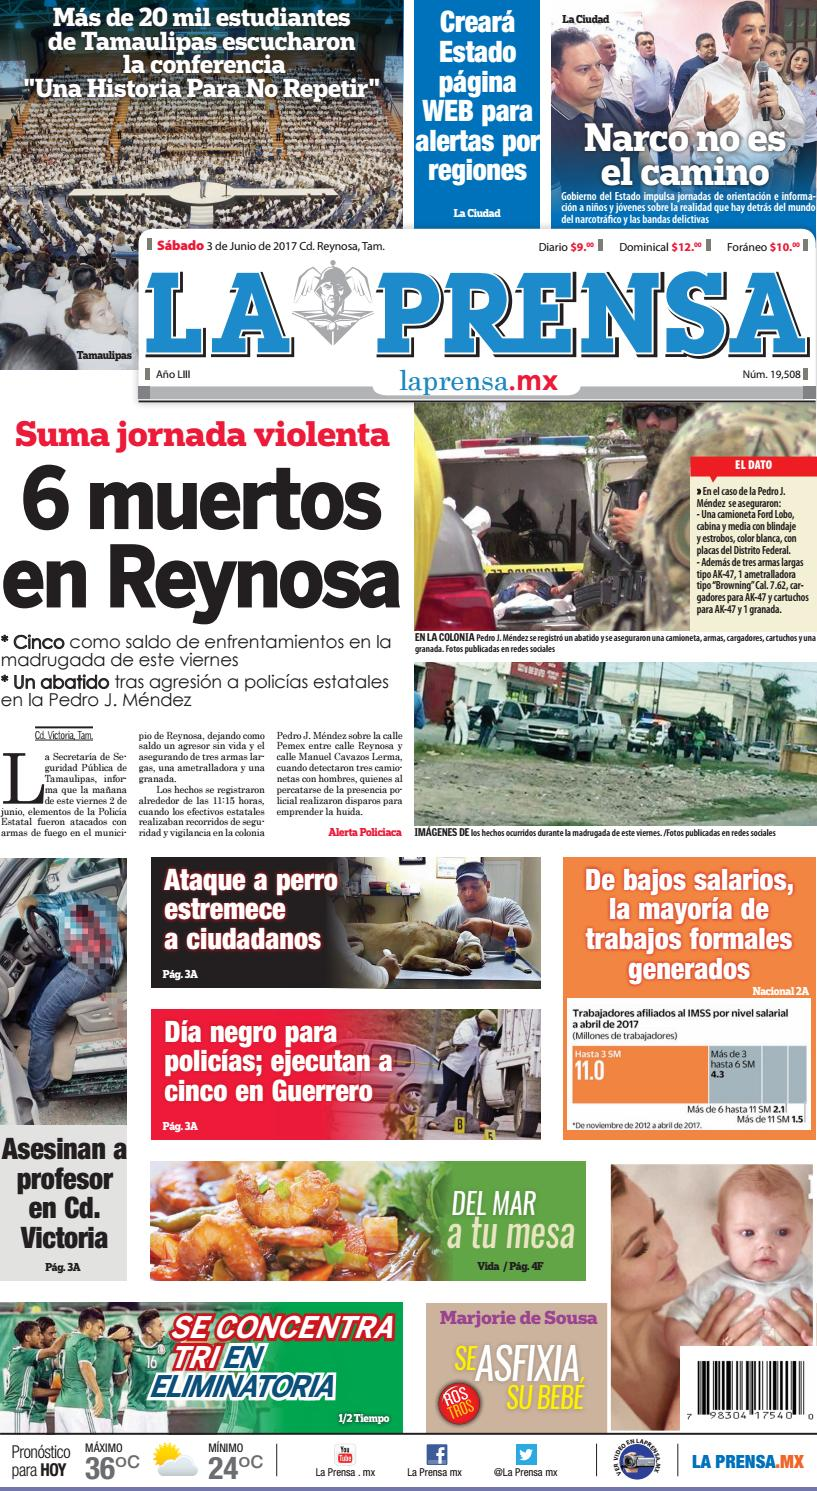 Anays Leyva Edad laprensala prensa de reynosa - issuu